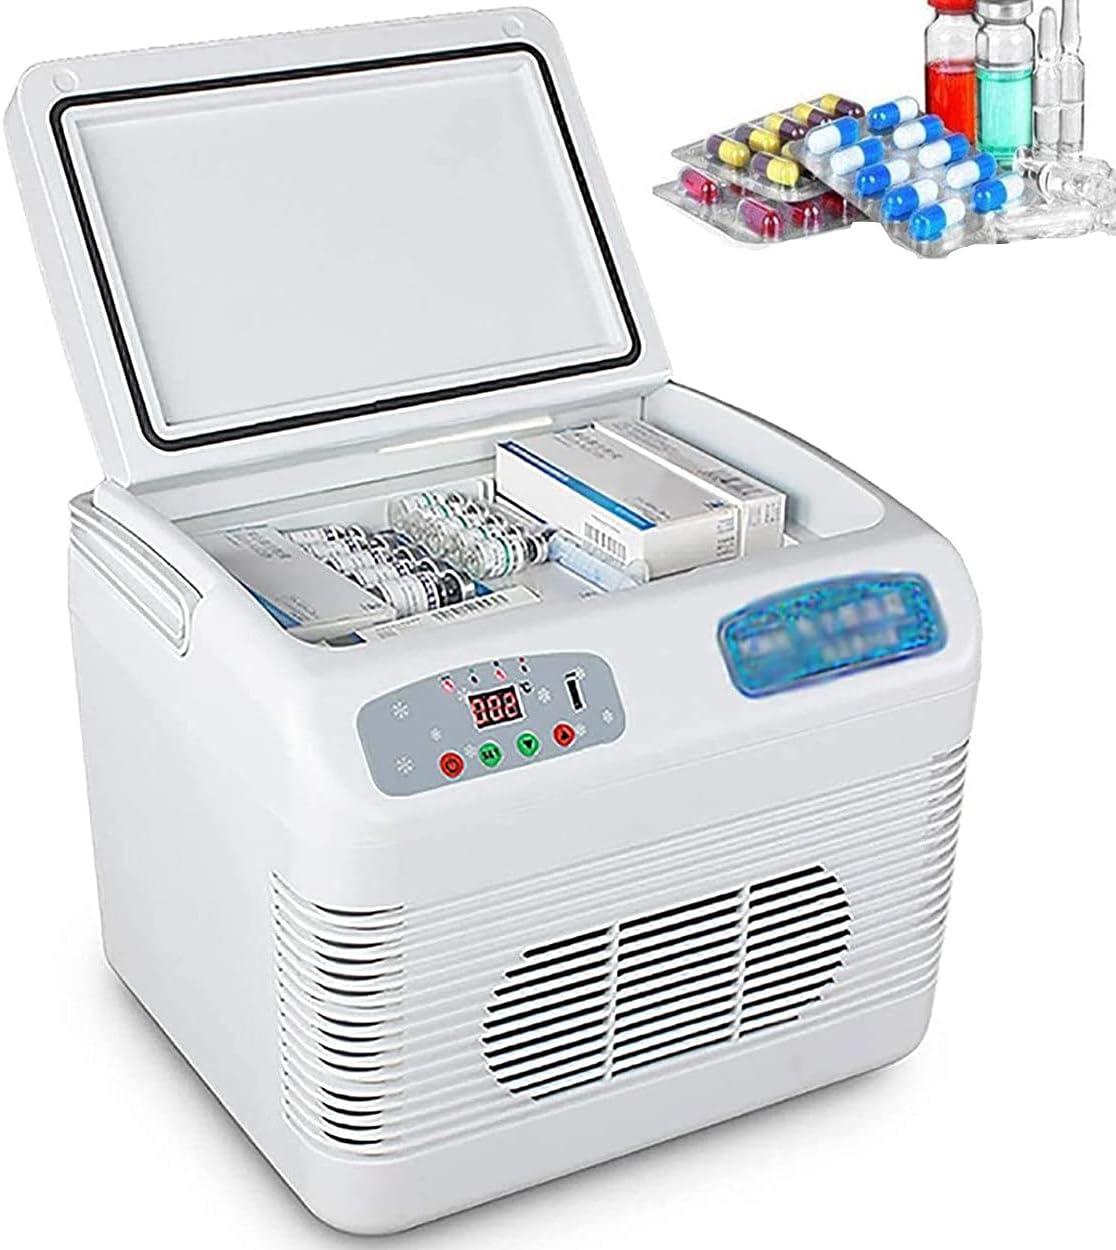 Ranking TOP13 Insulin Cooler Refrigerated Box - Denver Mall C USB Mini Case